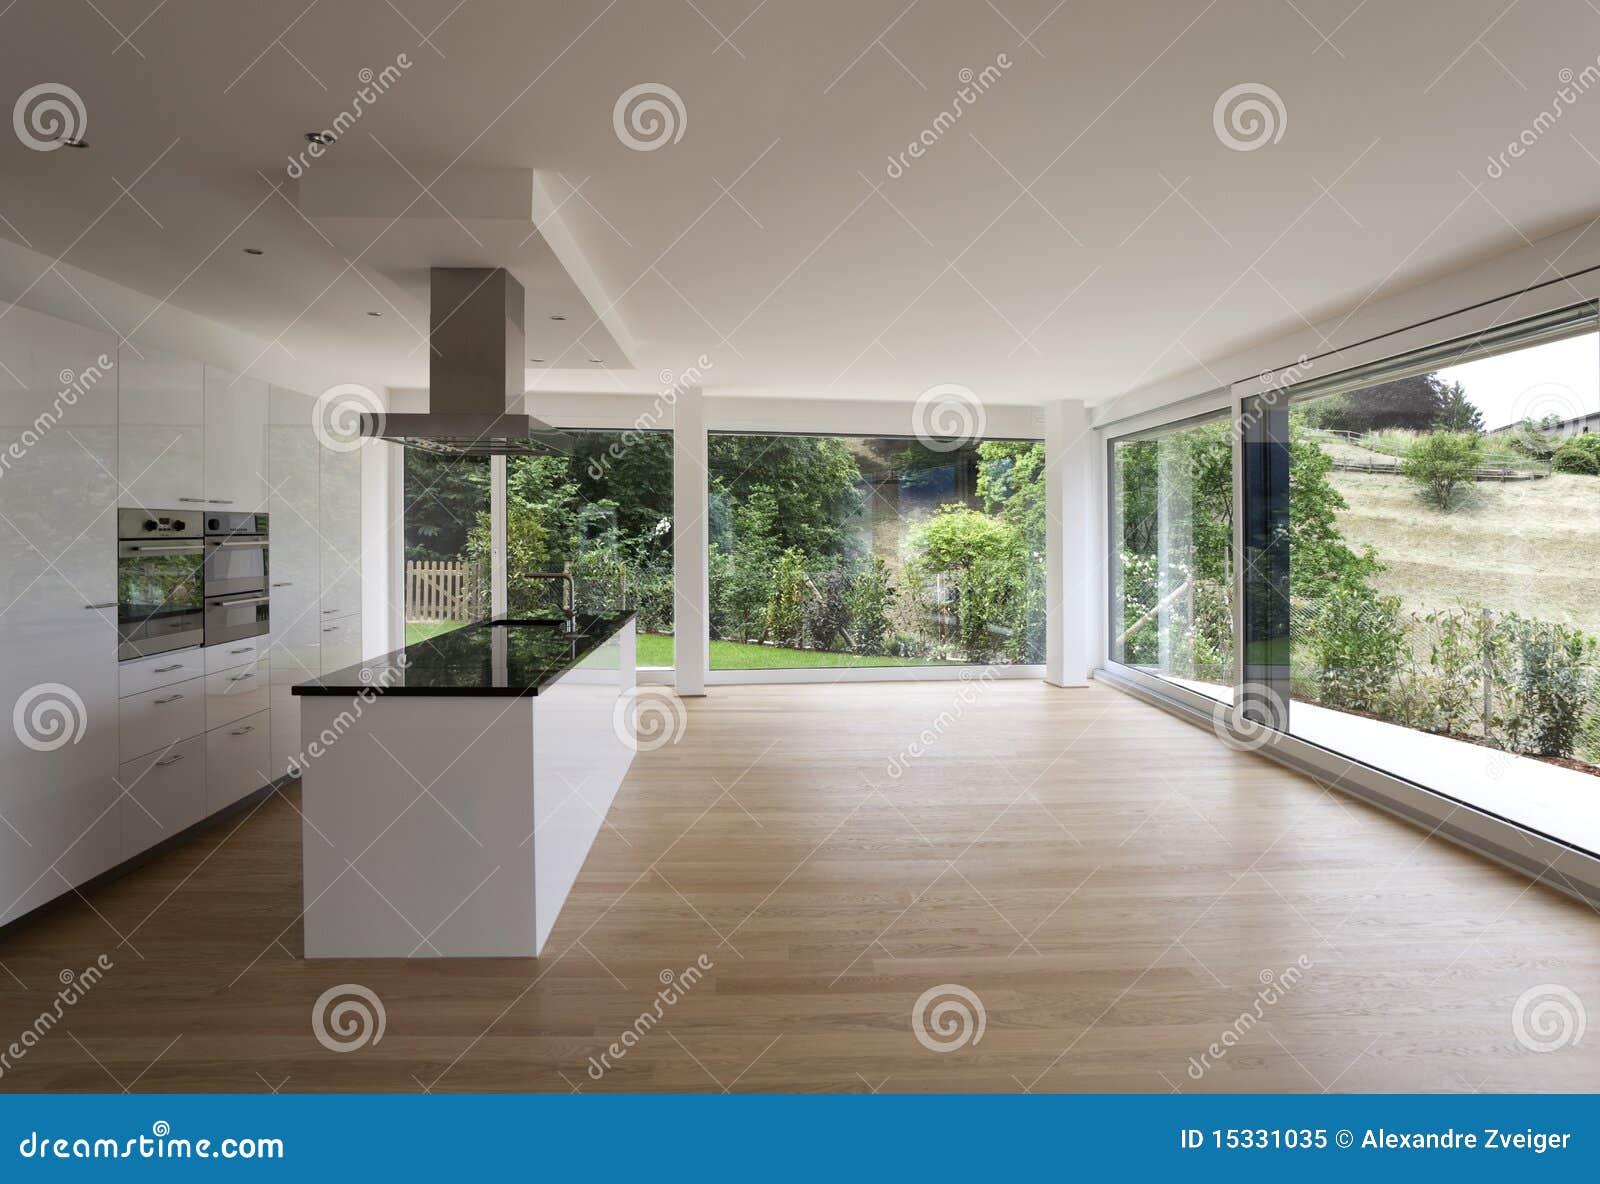 Beautiful interior of a modern house royalty free stock - Interieur de maison contemporaine ...